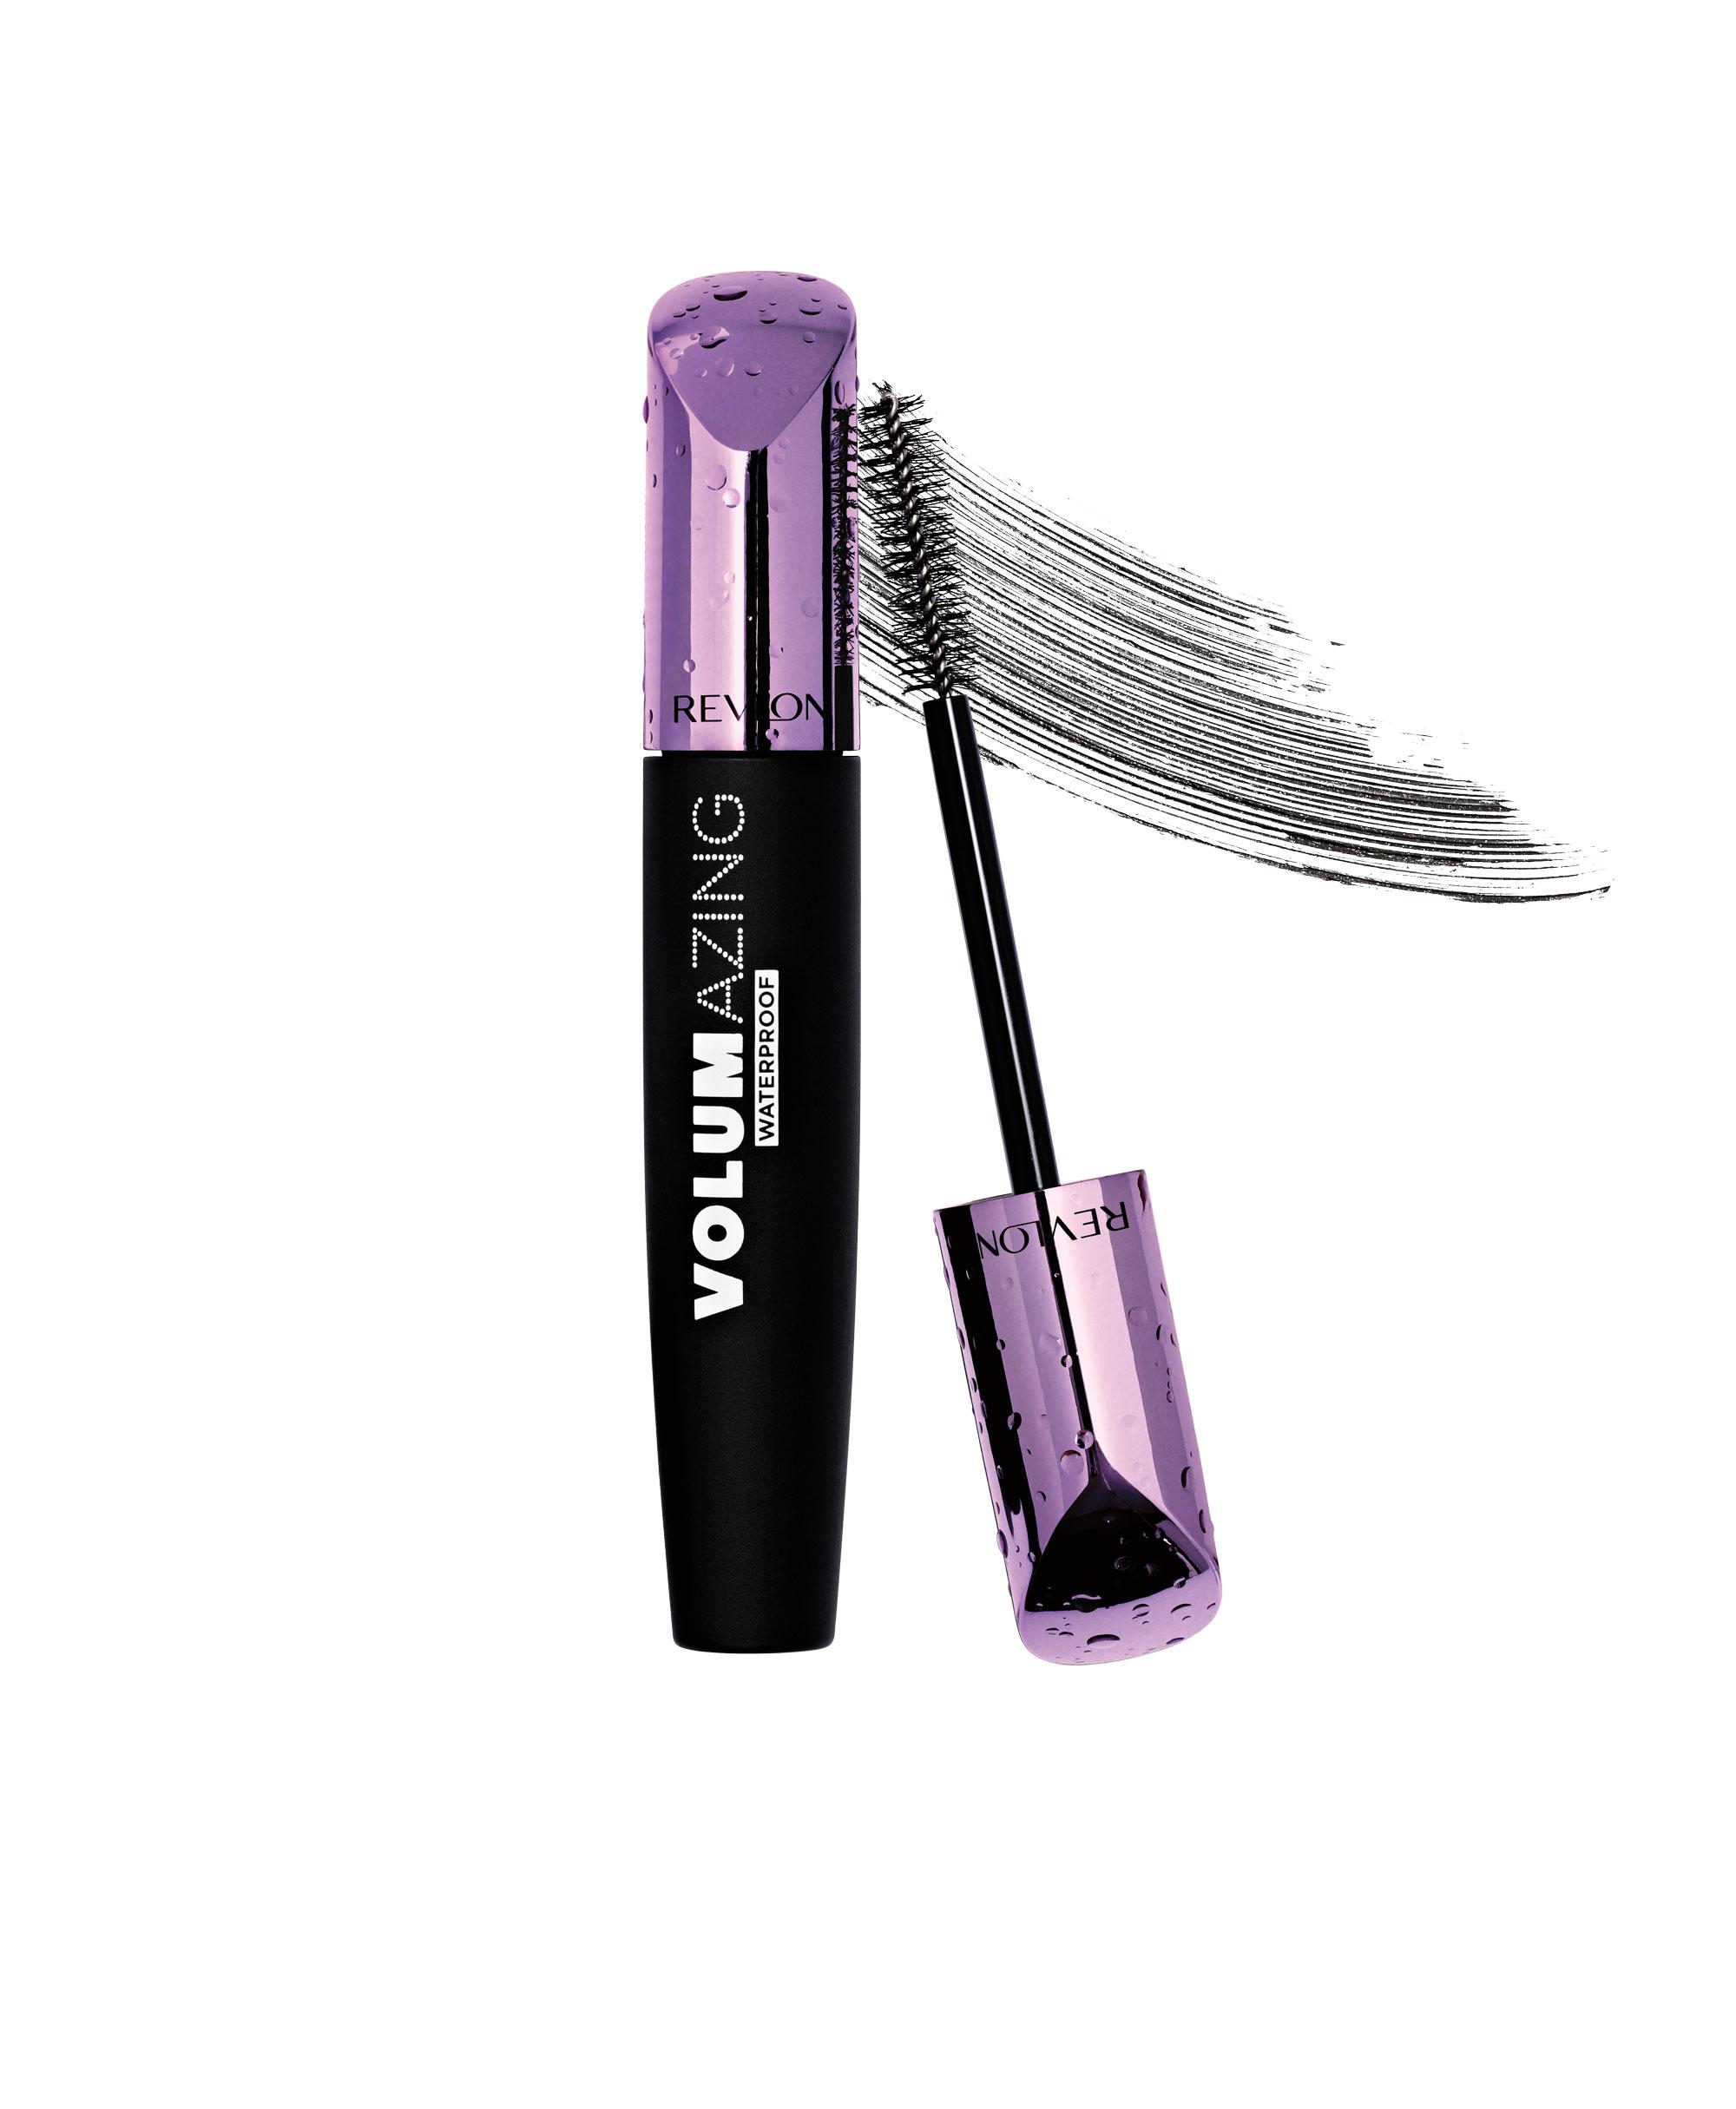 Revlon Volumazing Waterproof Mascara is available in February 2019